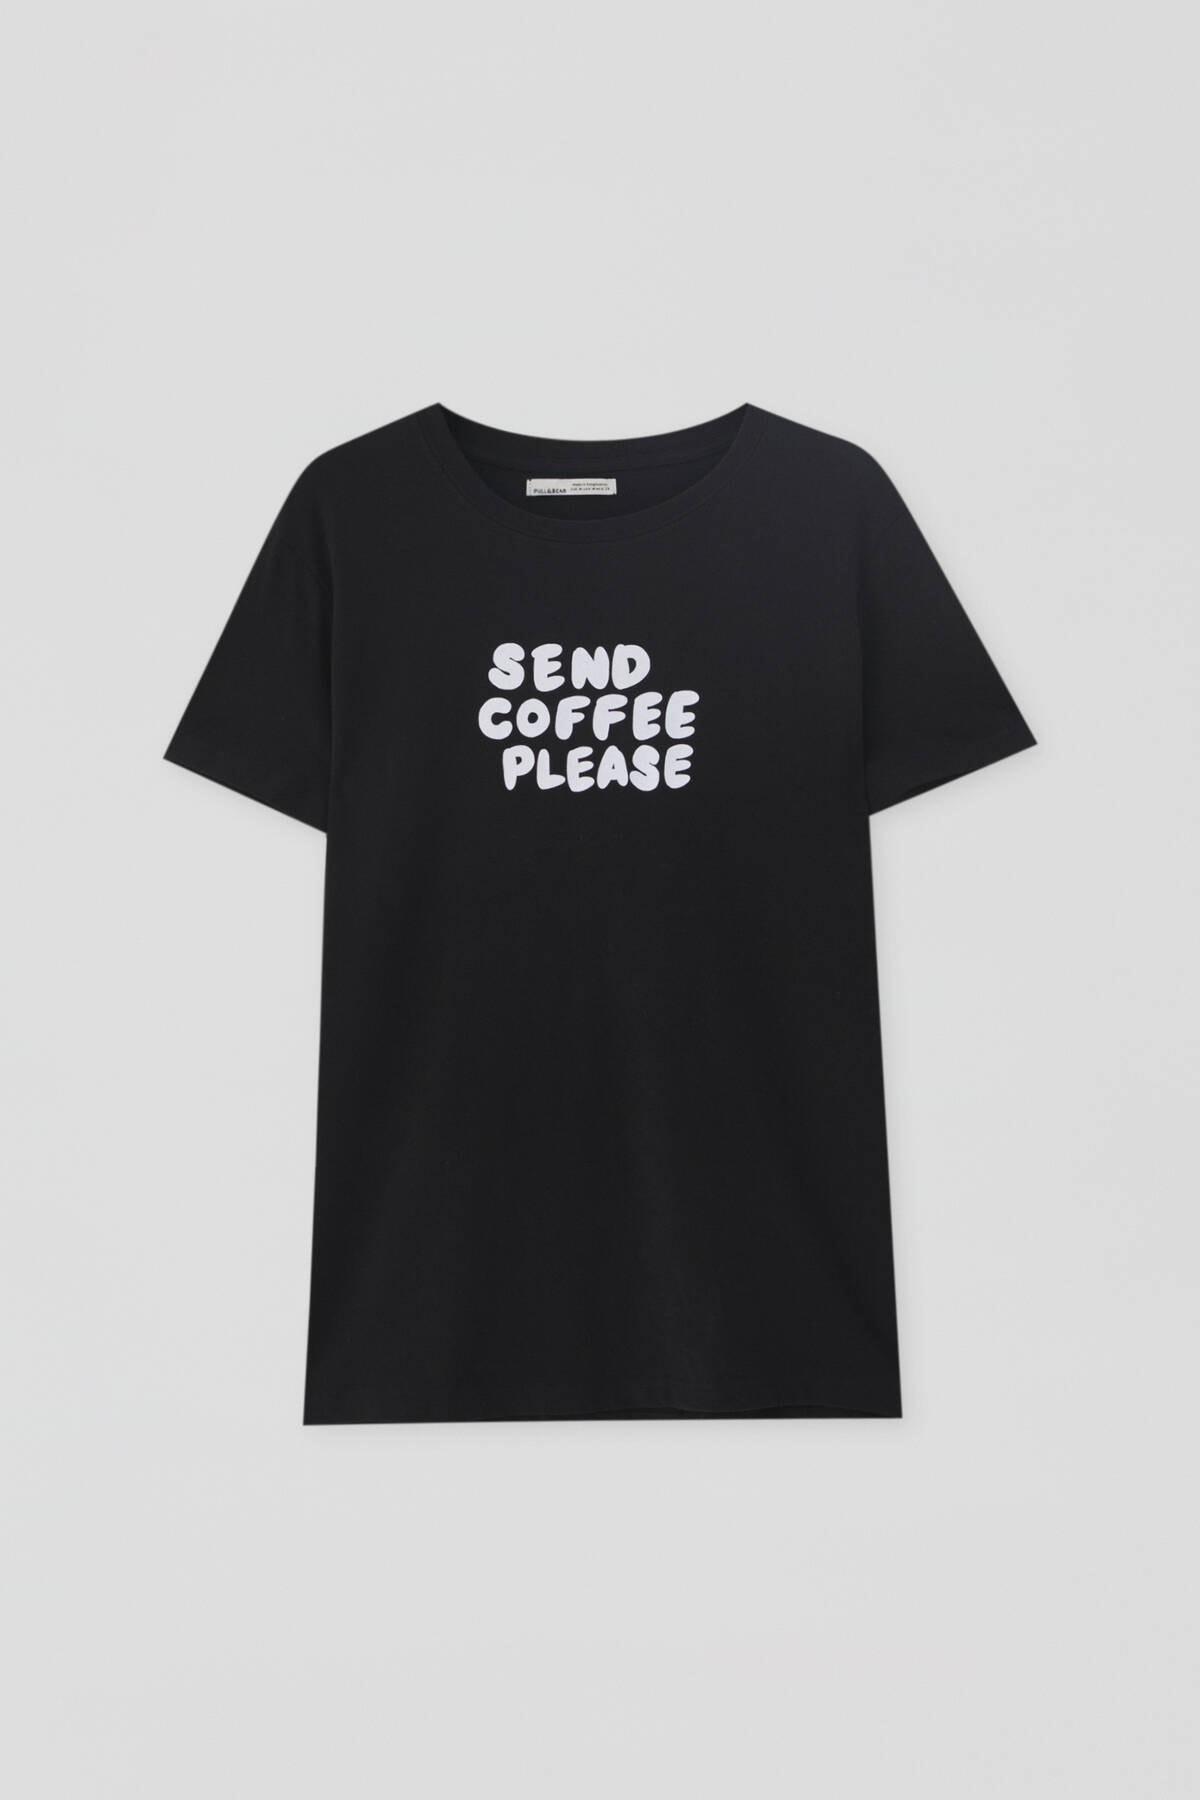 Pull & Bear Kadın Kontrast Sloganlı Siyah T-Shirt - %100 Organik Pamuklu 04240310 4